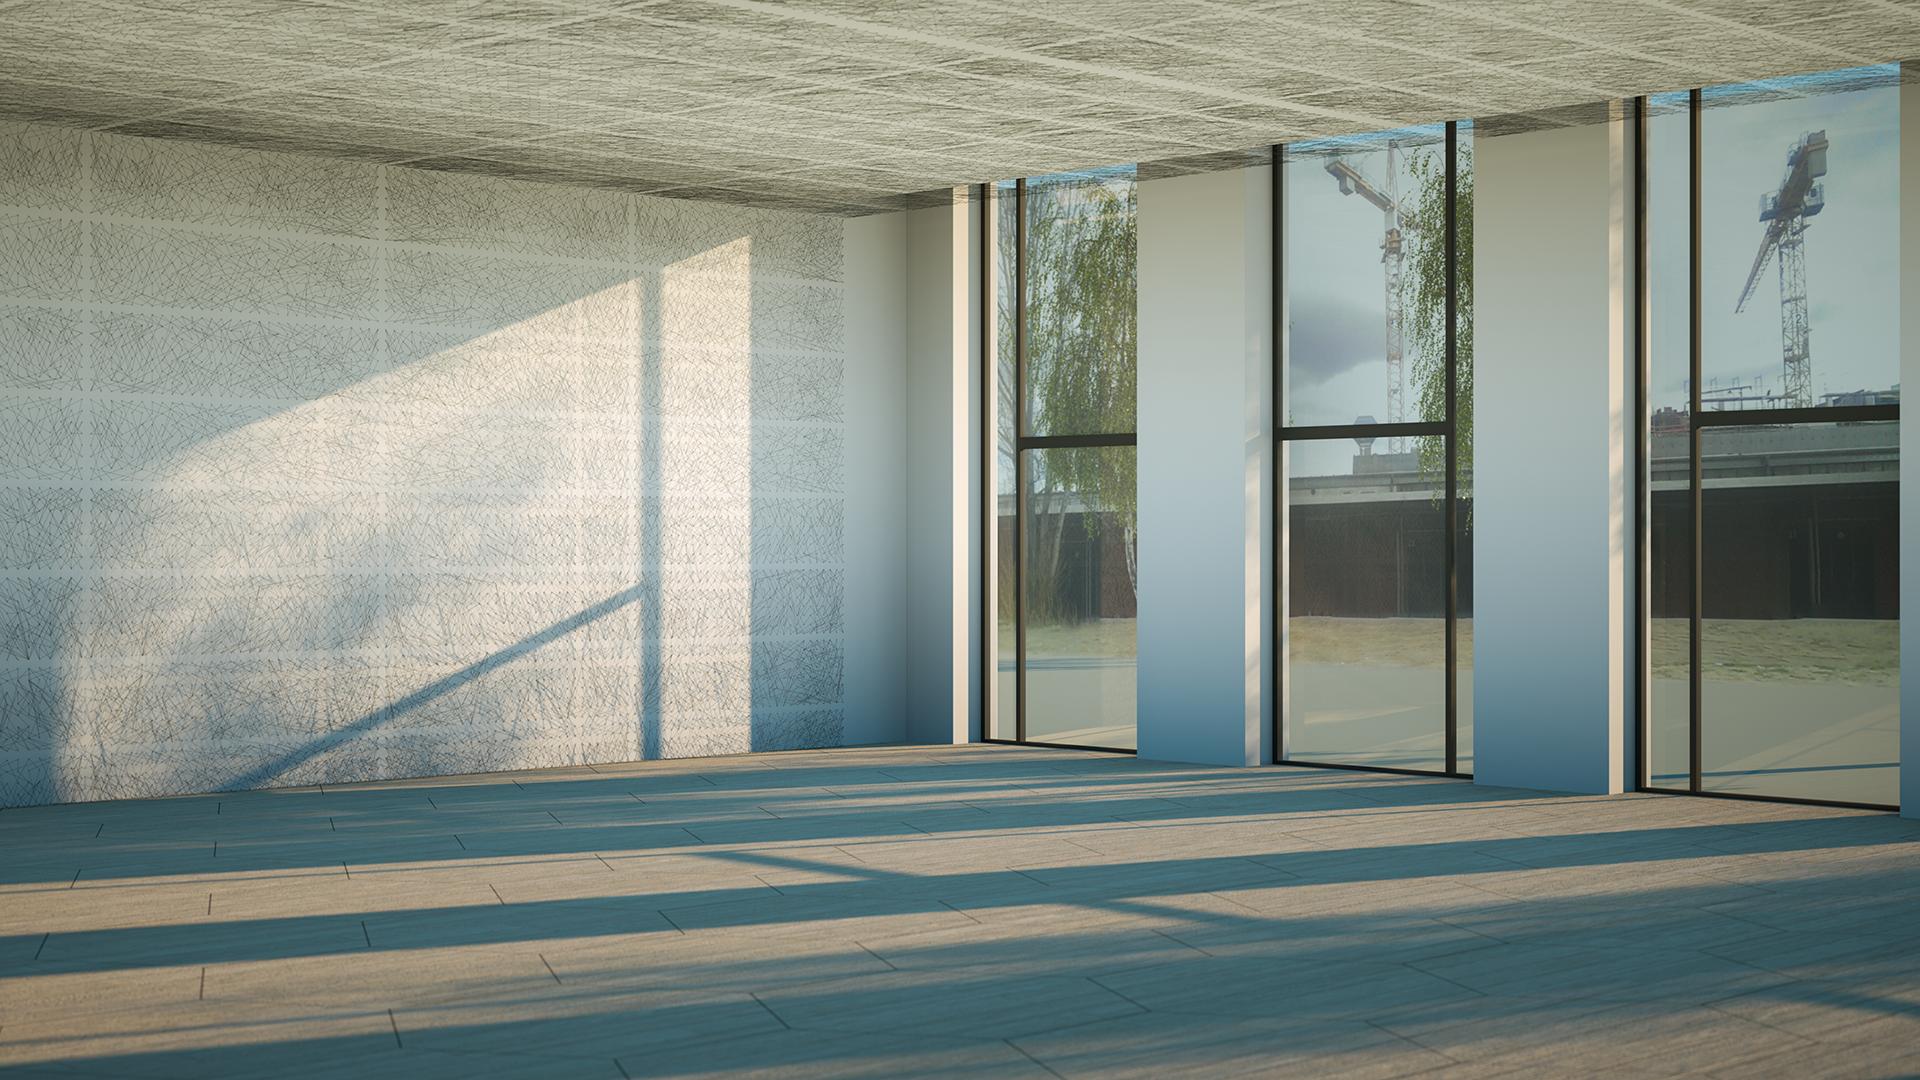 Reuter Schoger Architects: ABDA building interiors